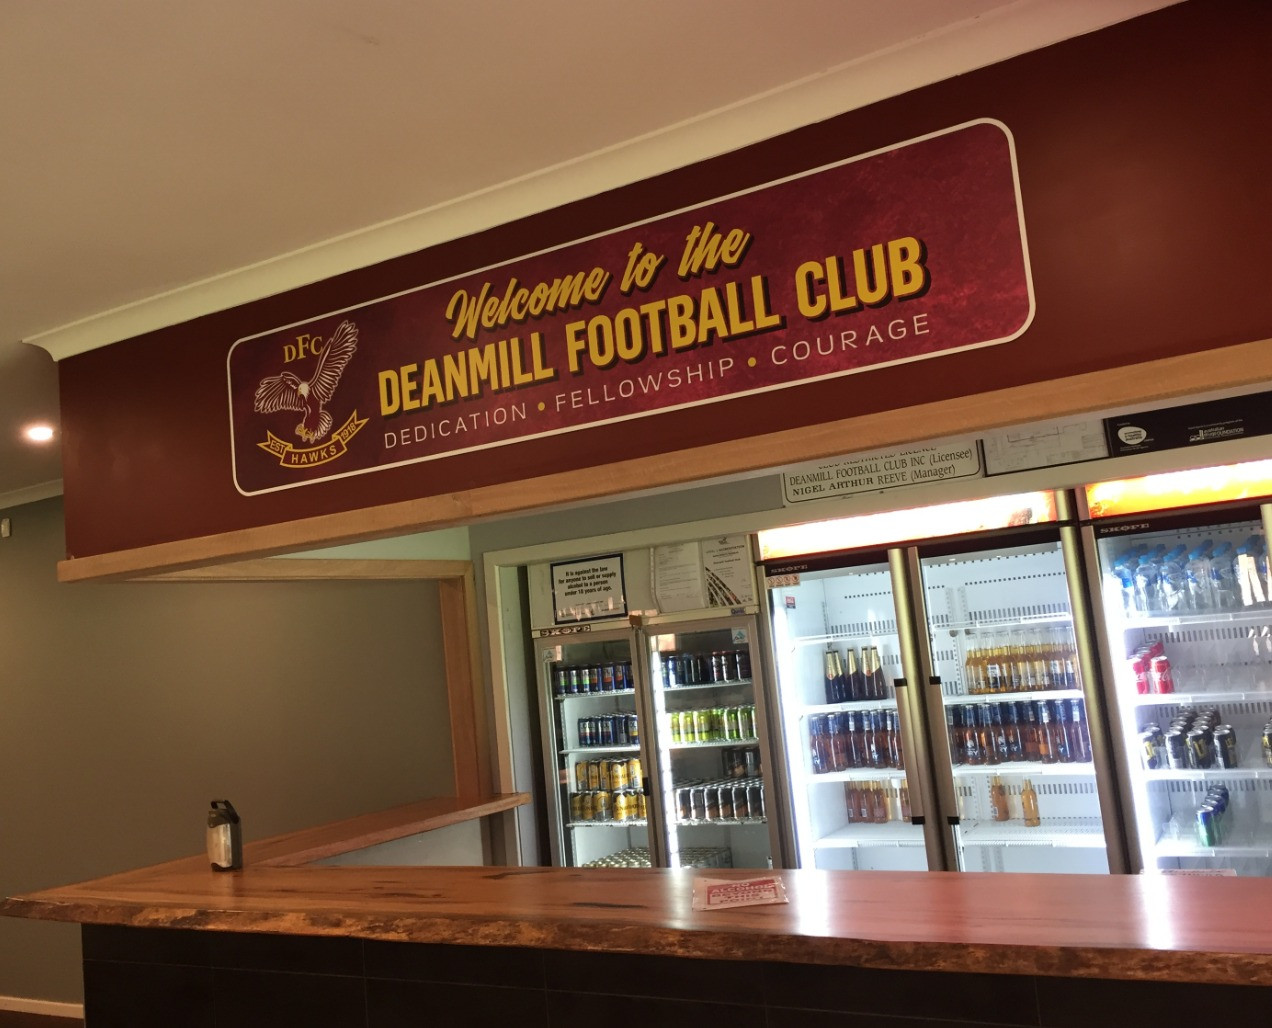 Deanmill Football Club 100th Anniversary Signs